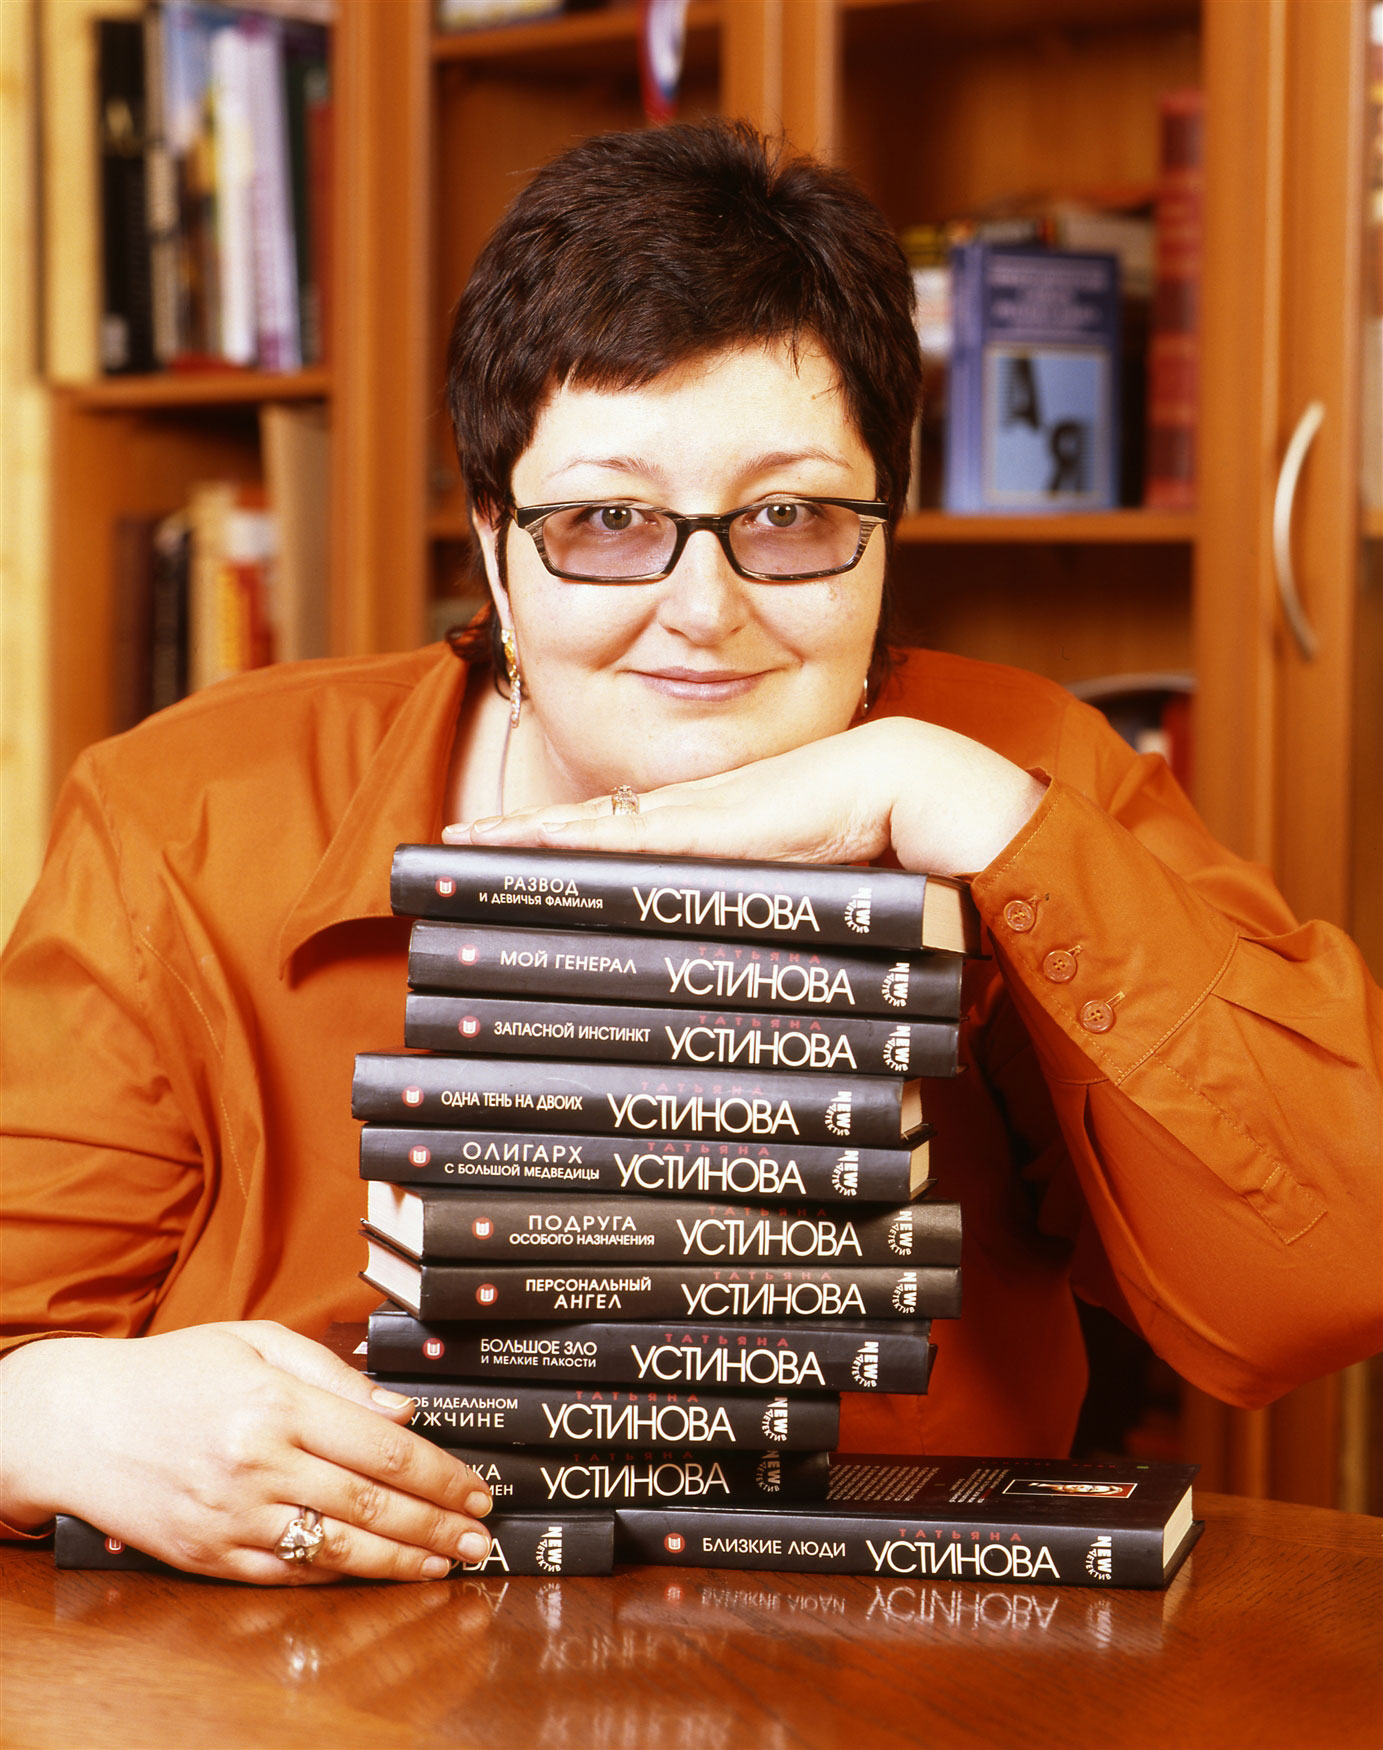 Татьяна Устинова. 2008 год